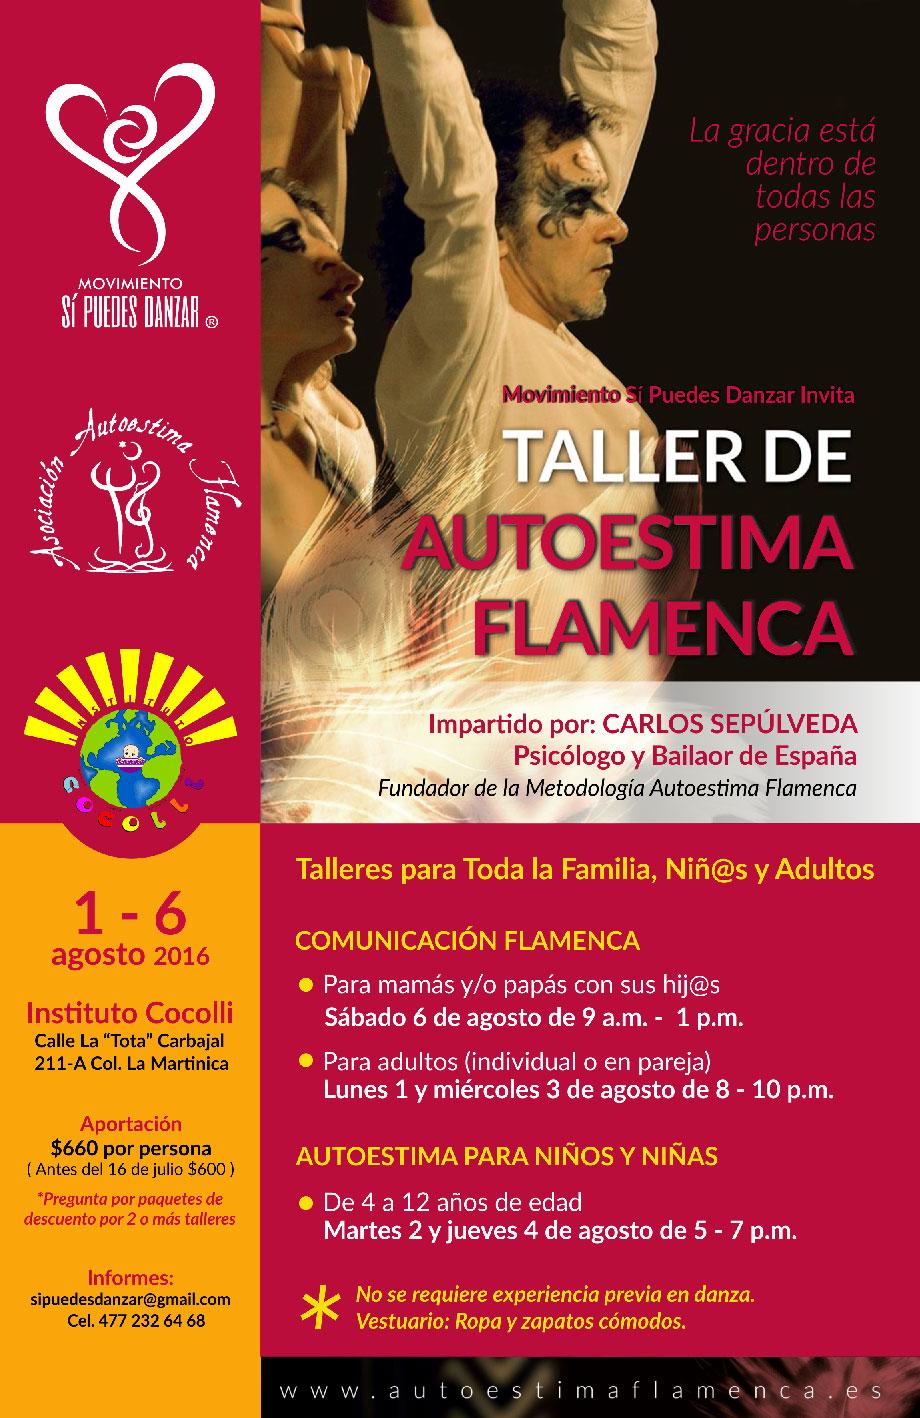 Taller de A. Flamenca en el Instituto Cocolli (México) 2016